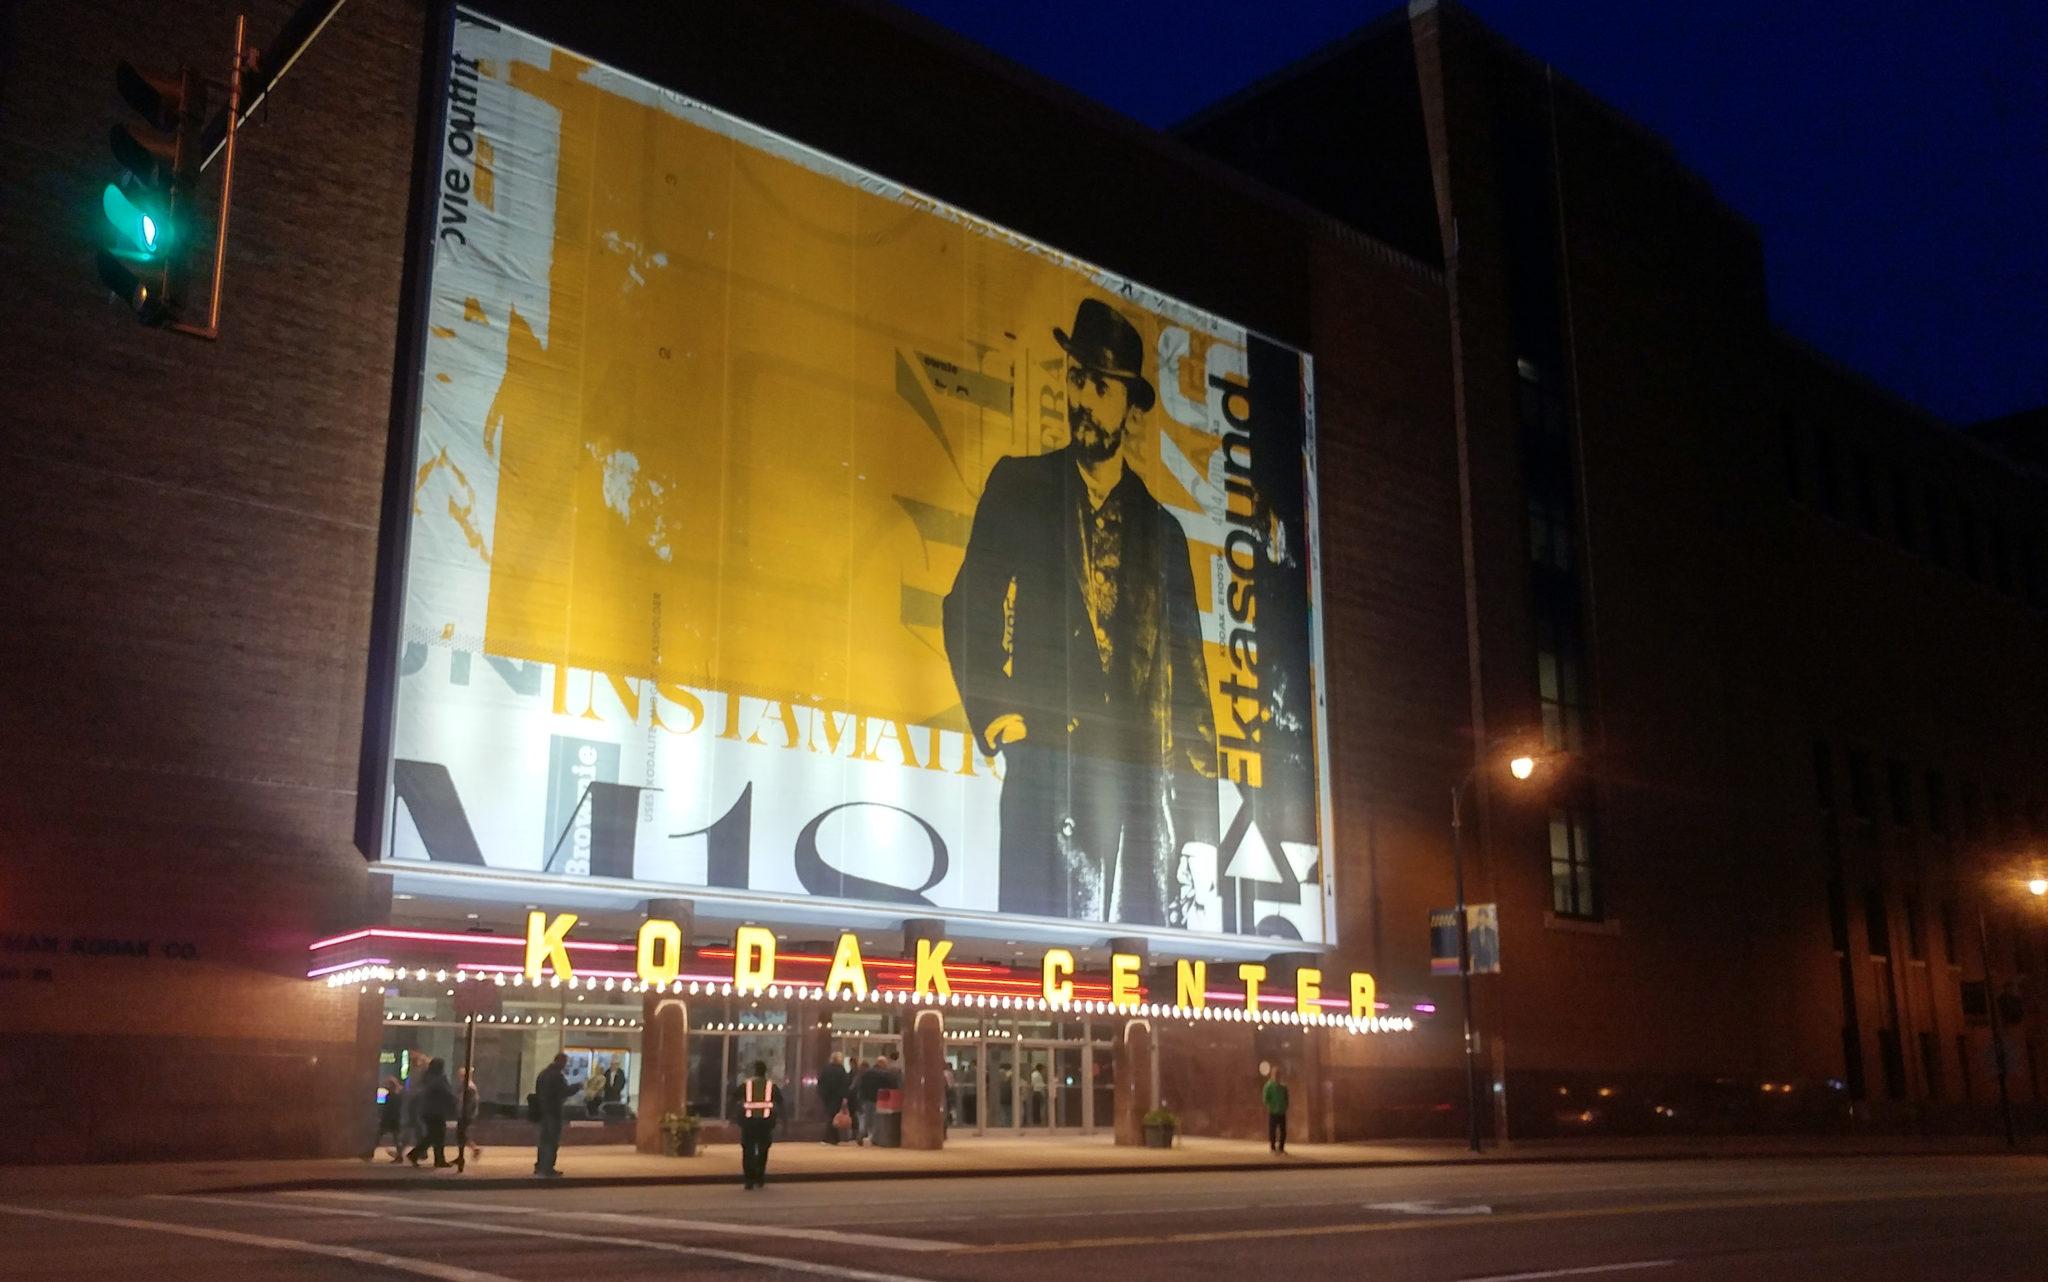 Illuminated Signs at Kodak Center from Distance